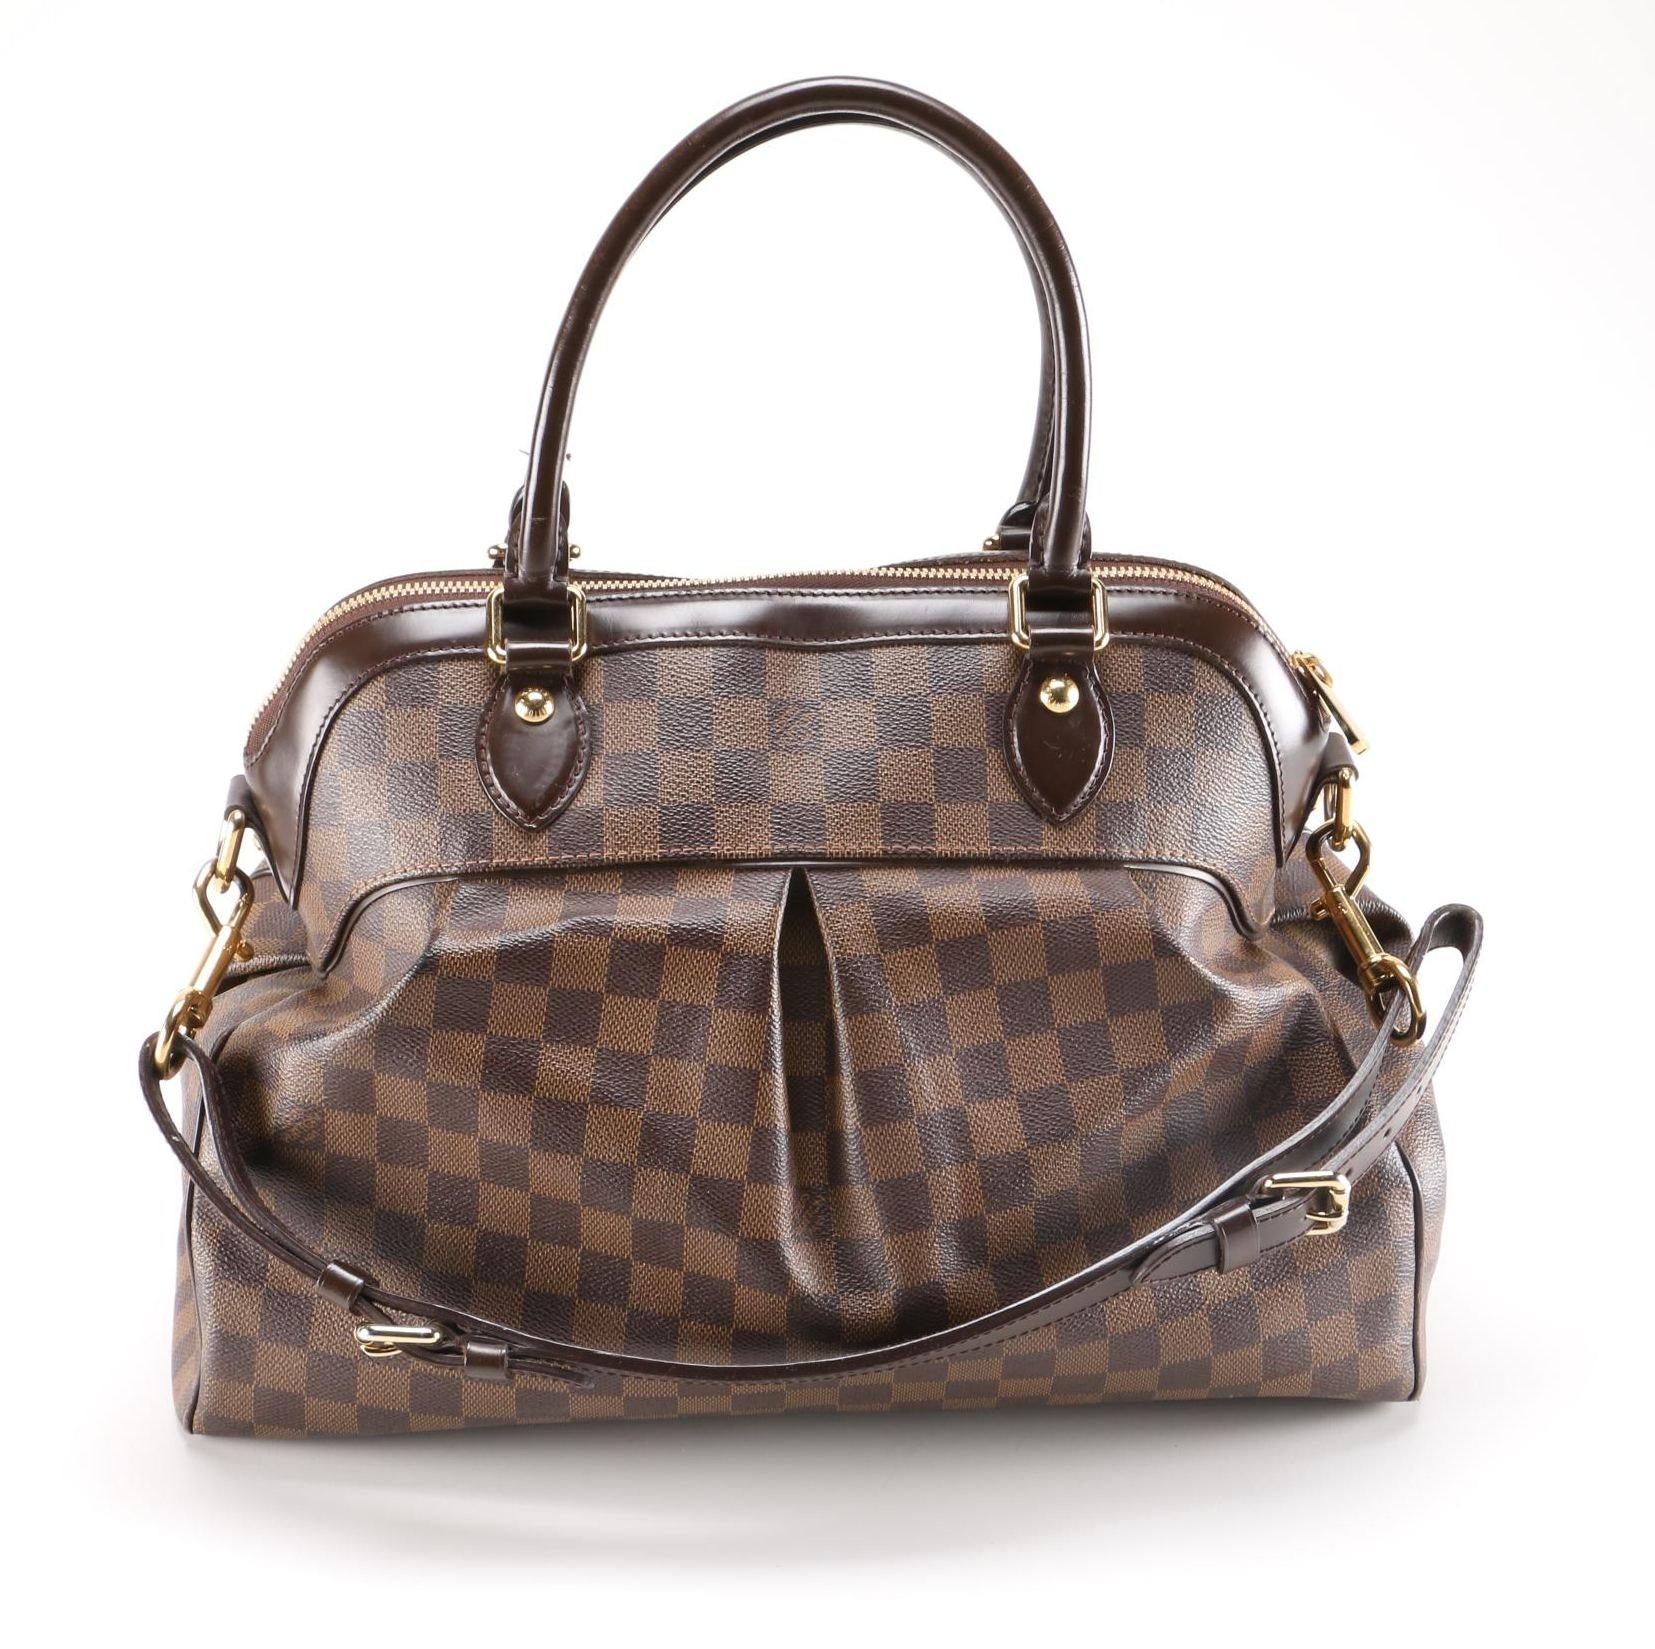 Louis Vuitton Damier Ebene Trevi GM Handbag